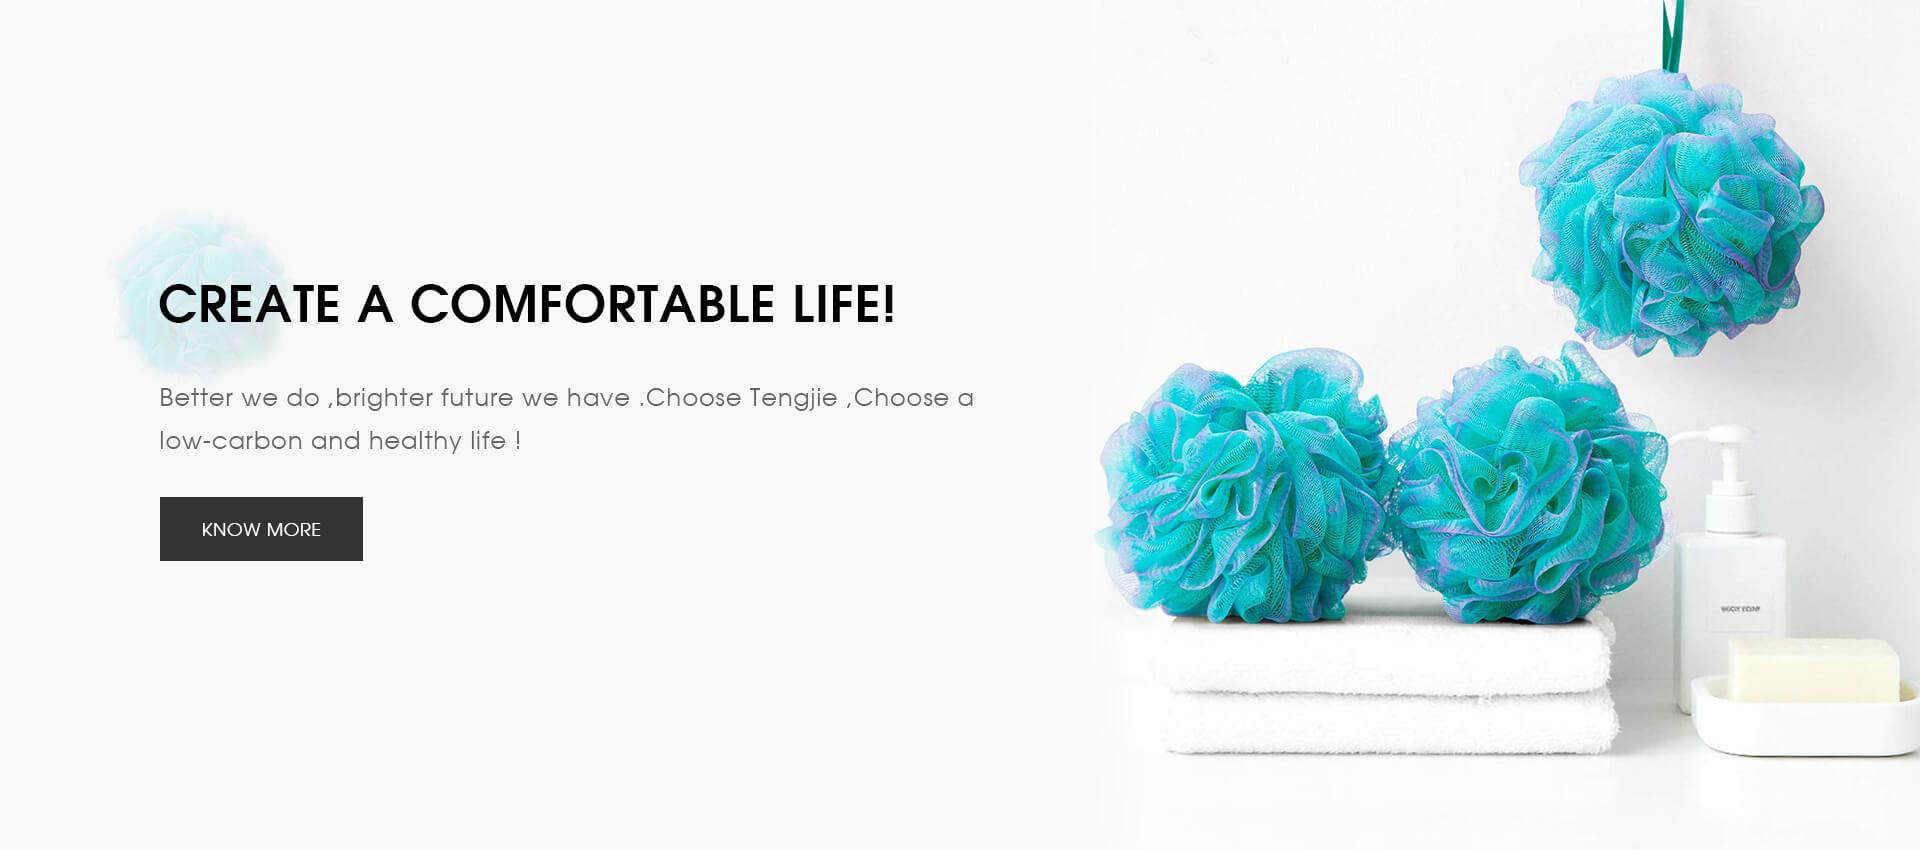 Create a comfortable life